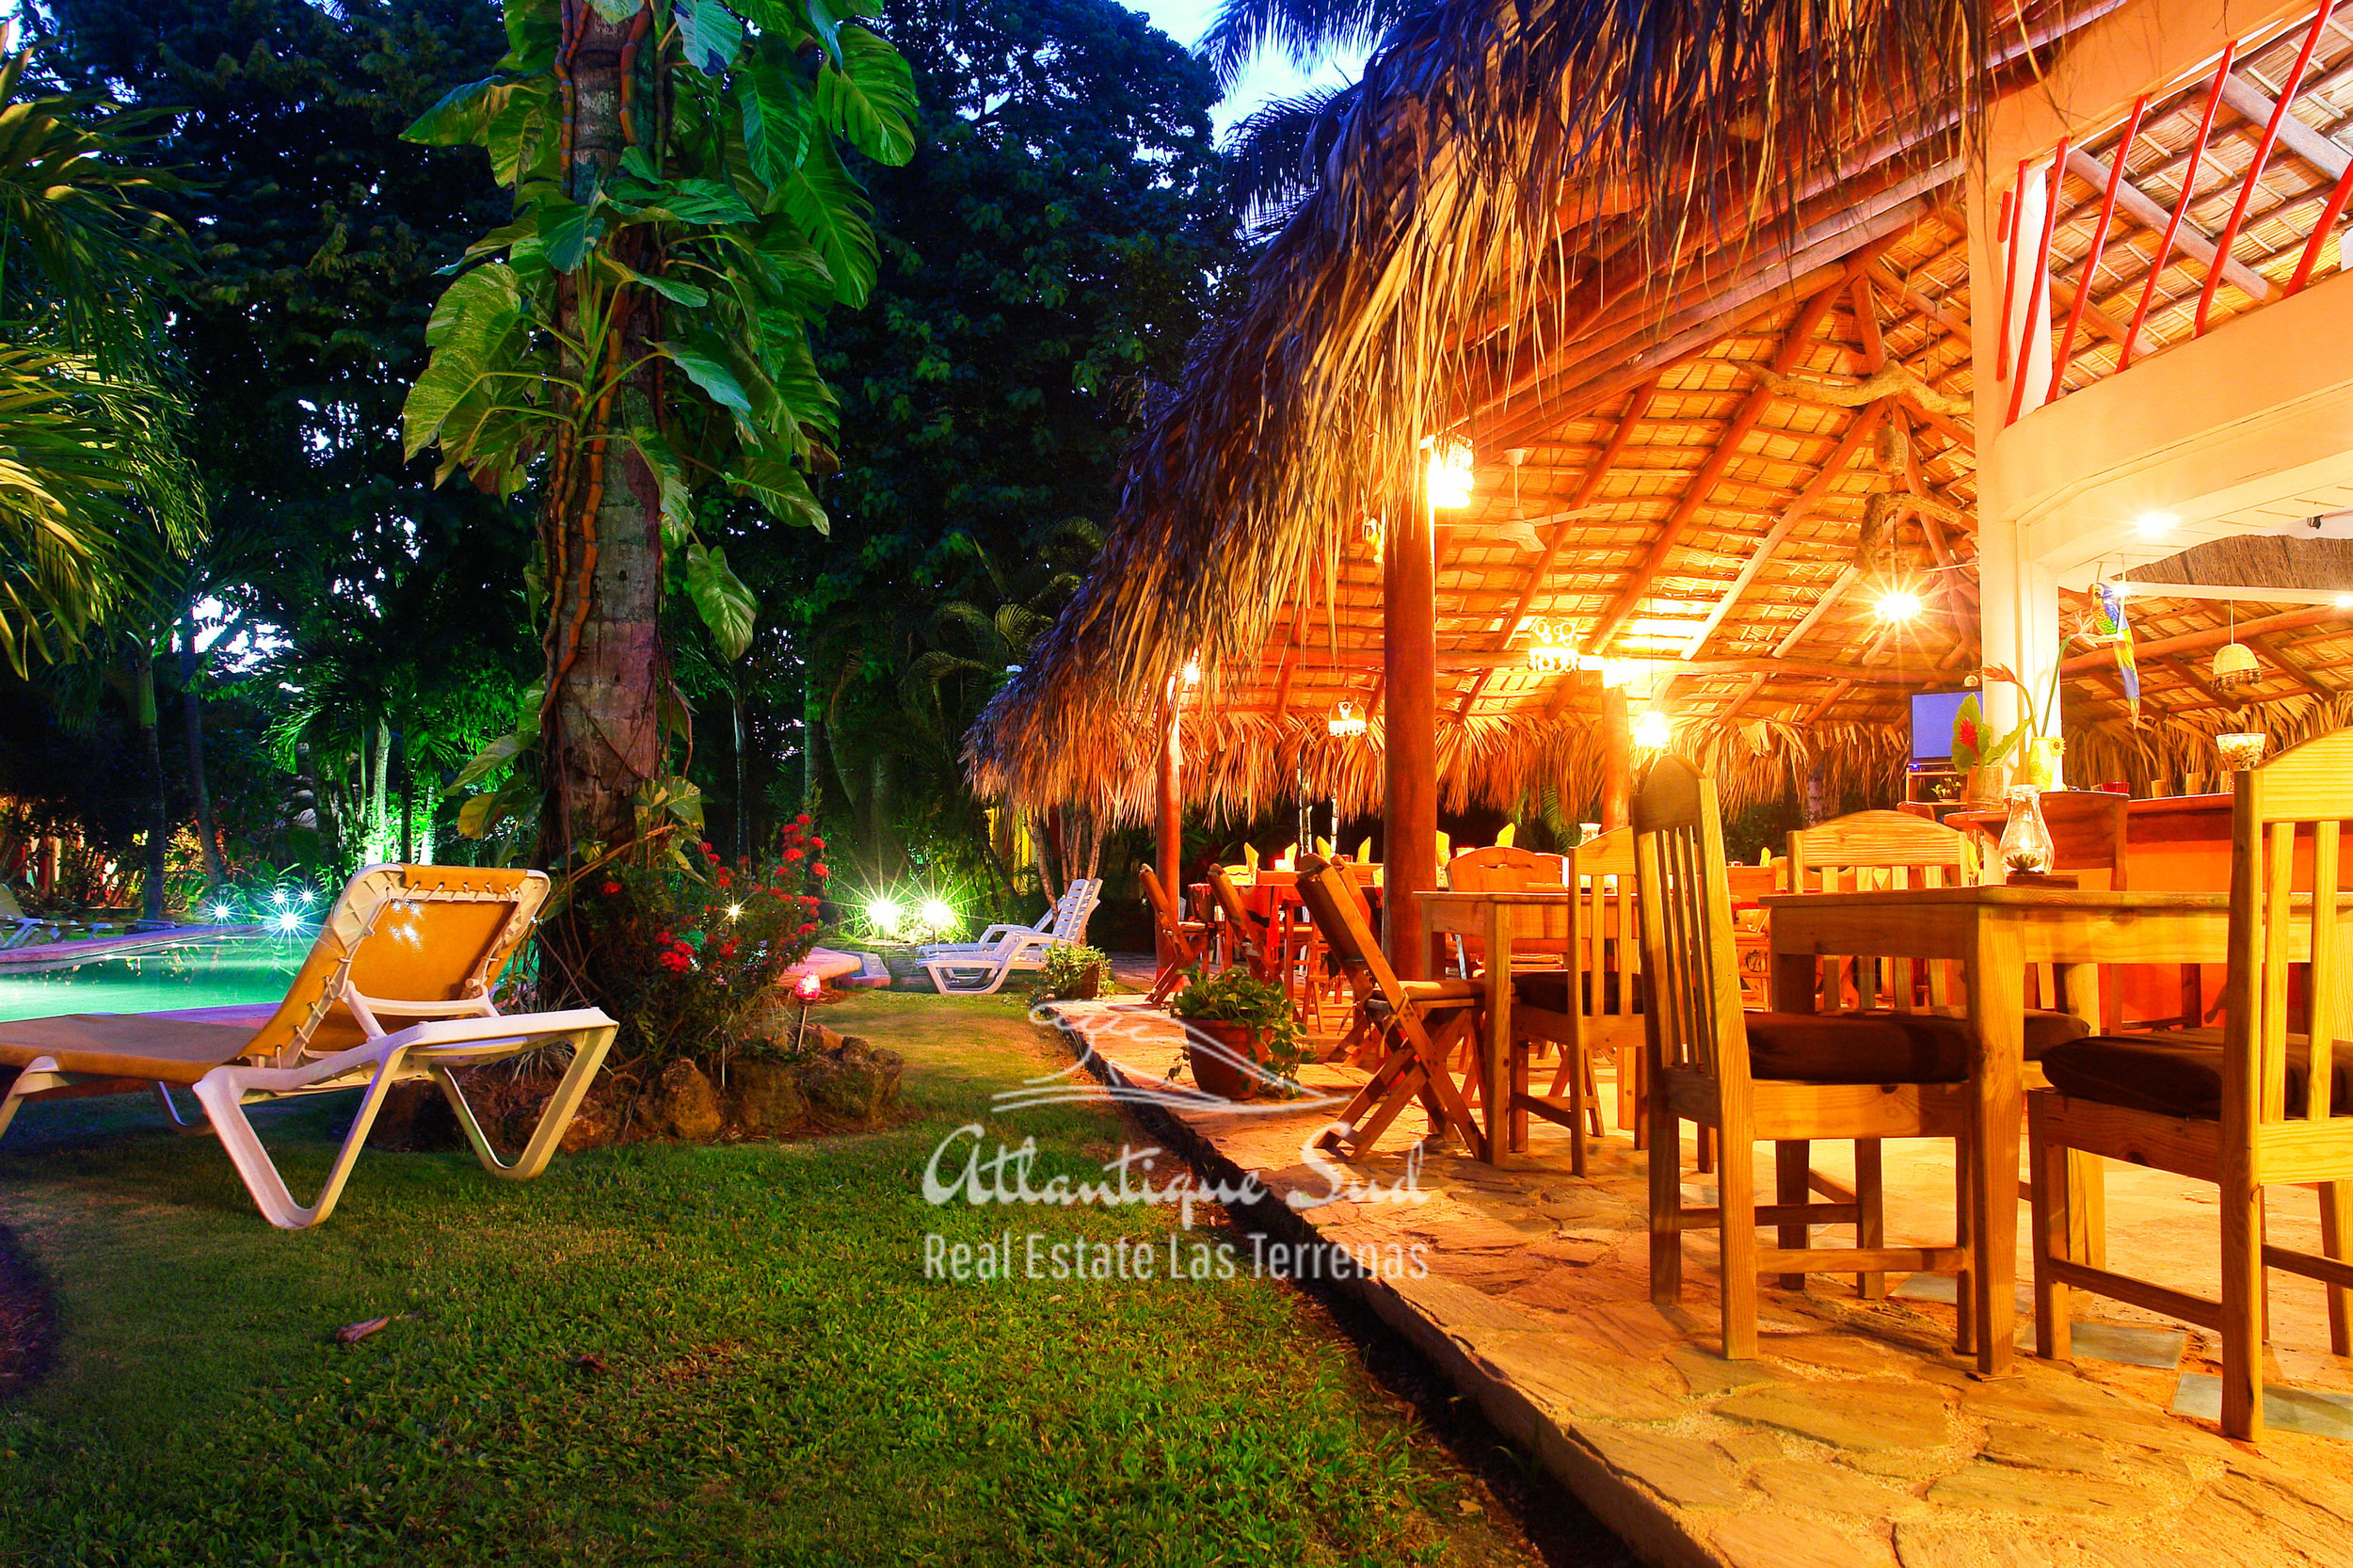 Colourful caribbean hotel in touristic heart Real Estate Las Terrenas Dominican Republic31.jpg